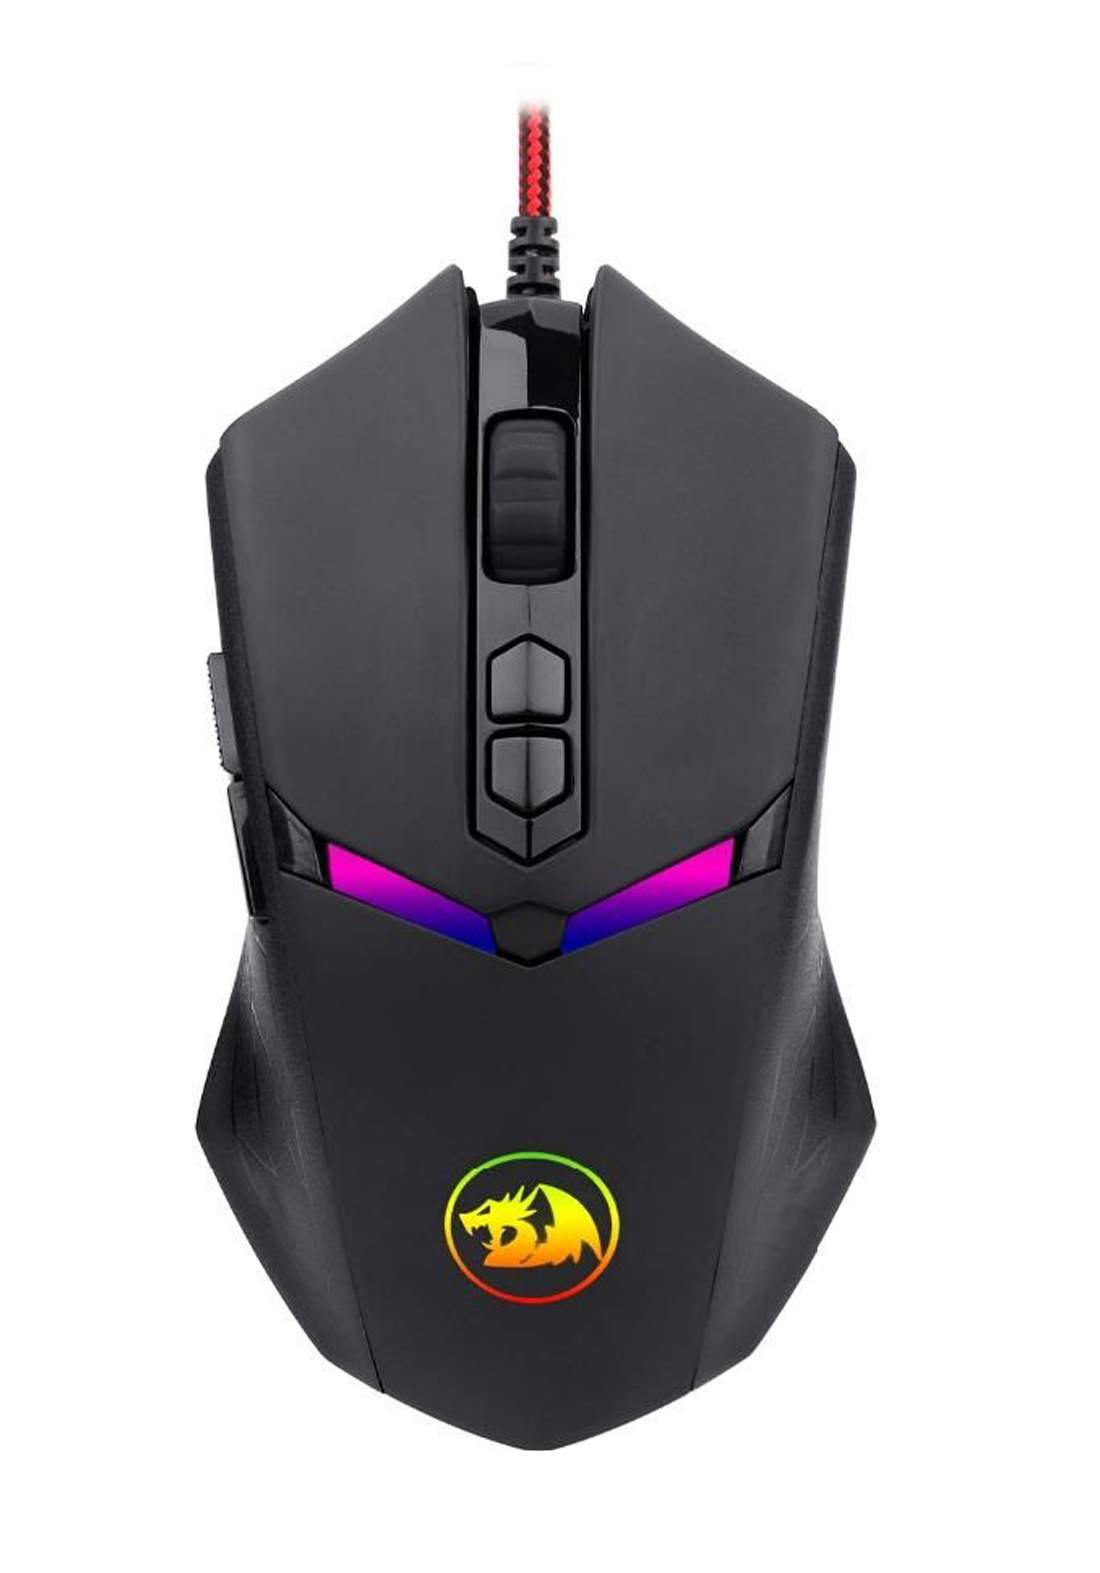 Redragon M602-1 Nemeanlion 2 RGB Gaming Mouse